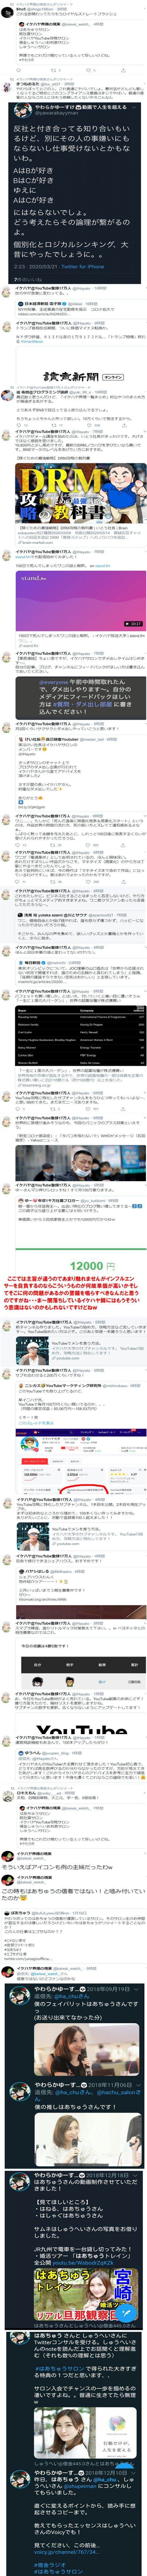 200323-A3